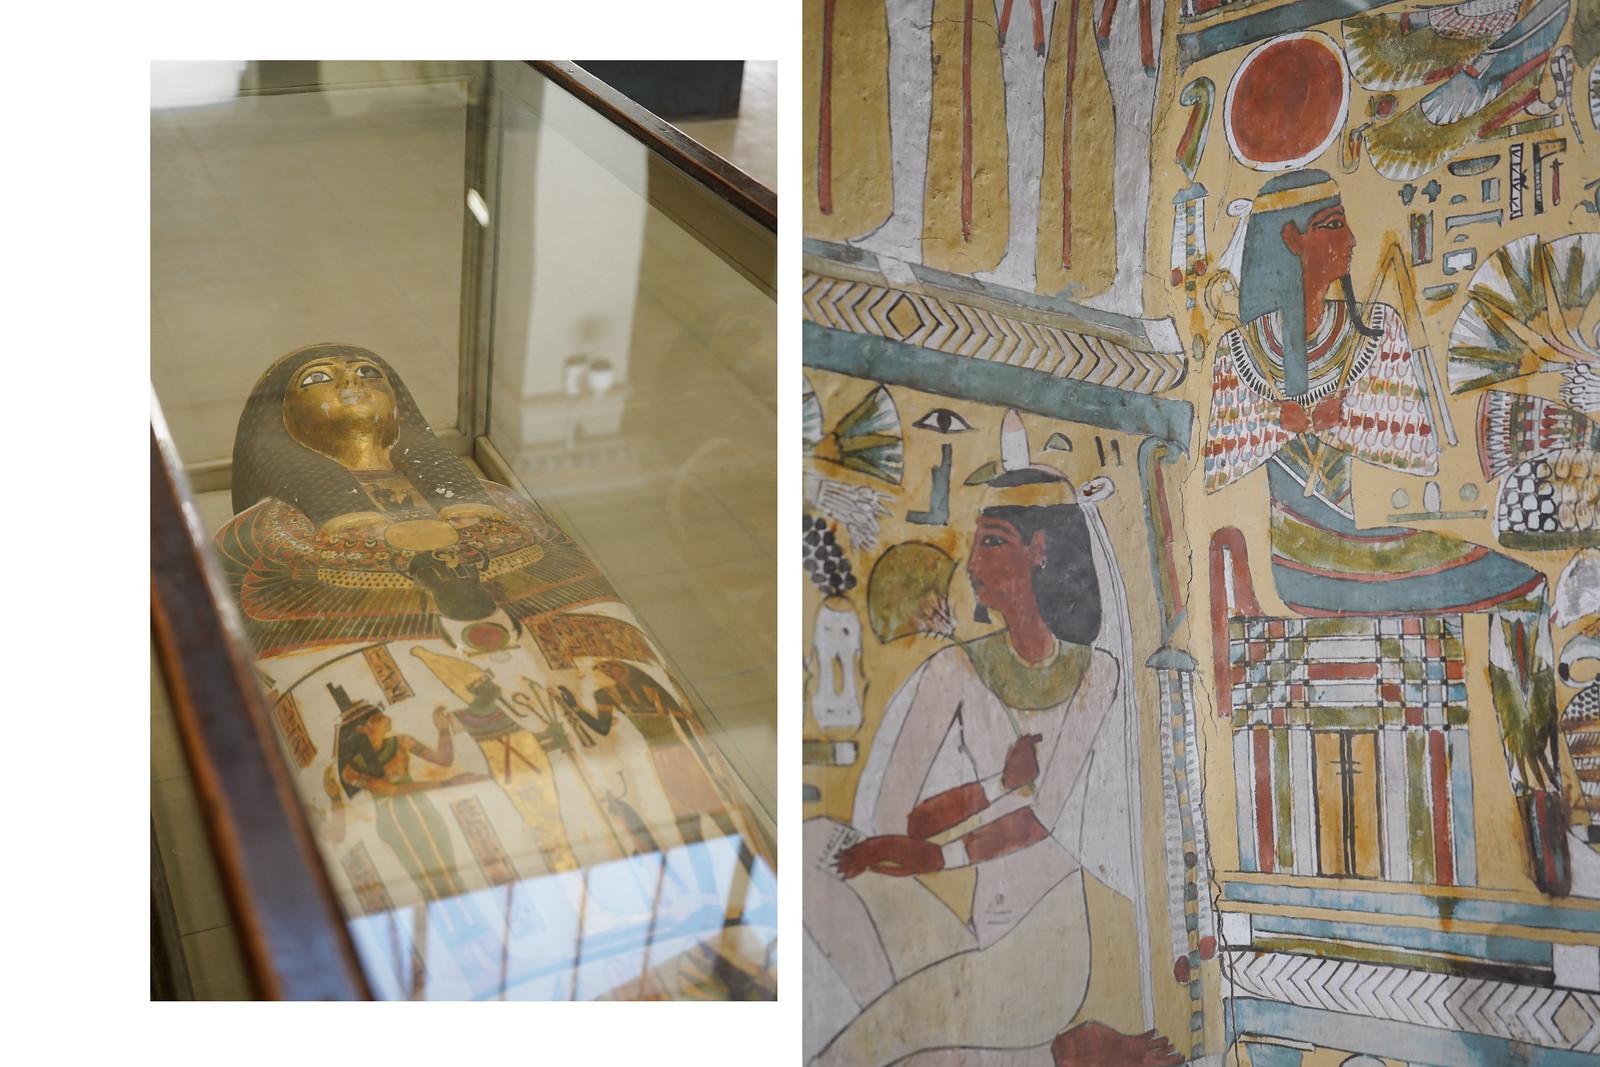 duo egipto 5